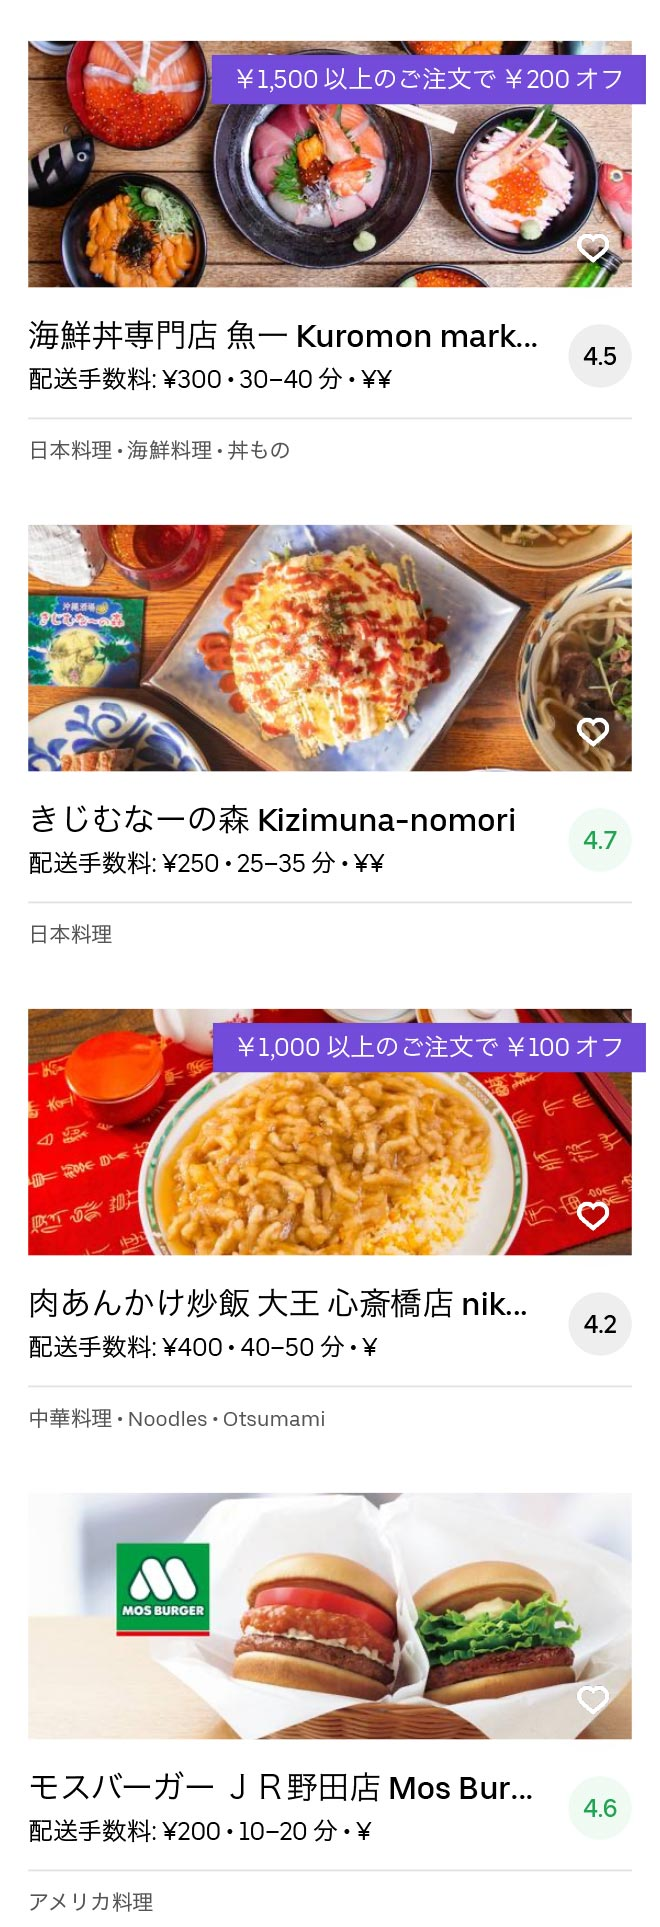 Osaka nishi kujo menu 2005 08